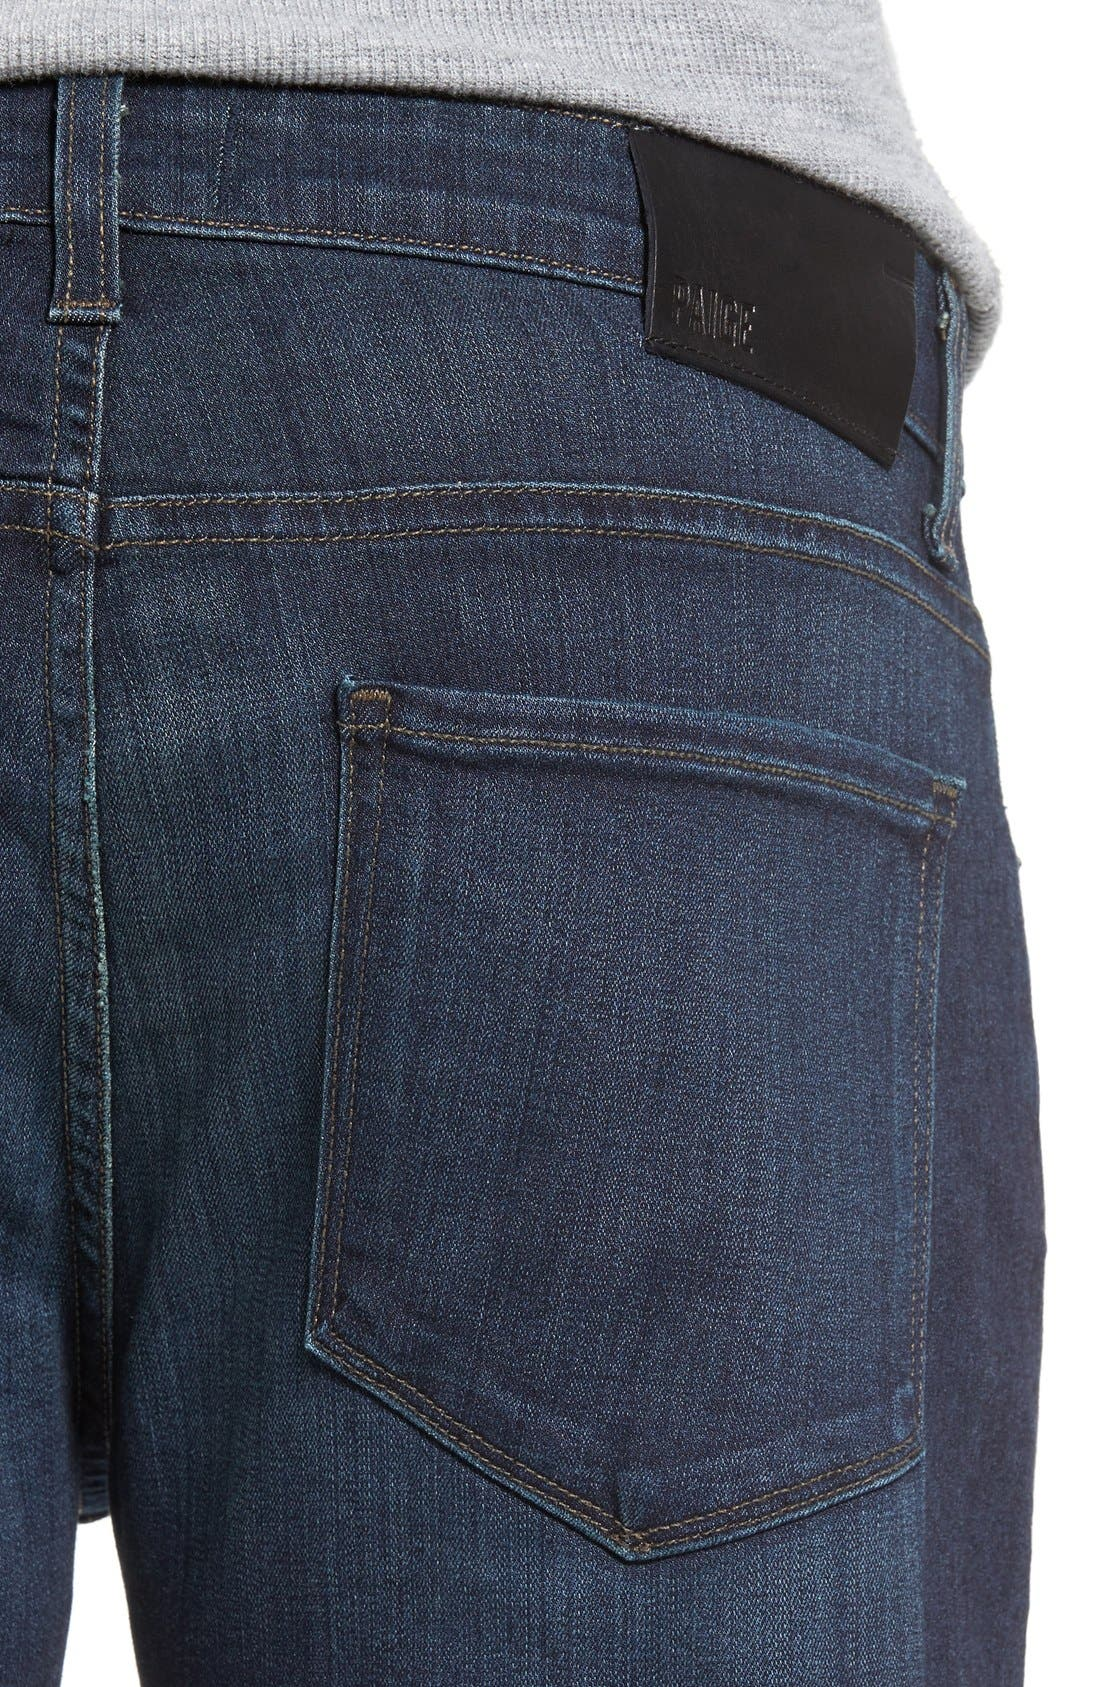 Transcend - Croft Skinny Fit Jeans,                             Alternate thumbnail 4, color,                             After Hours